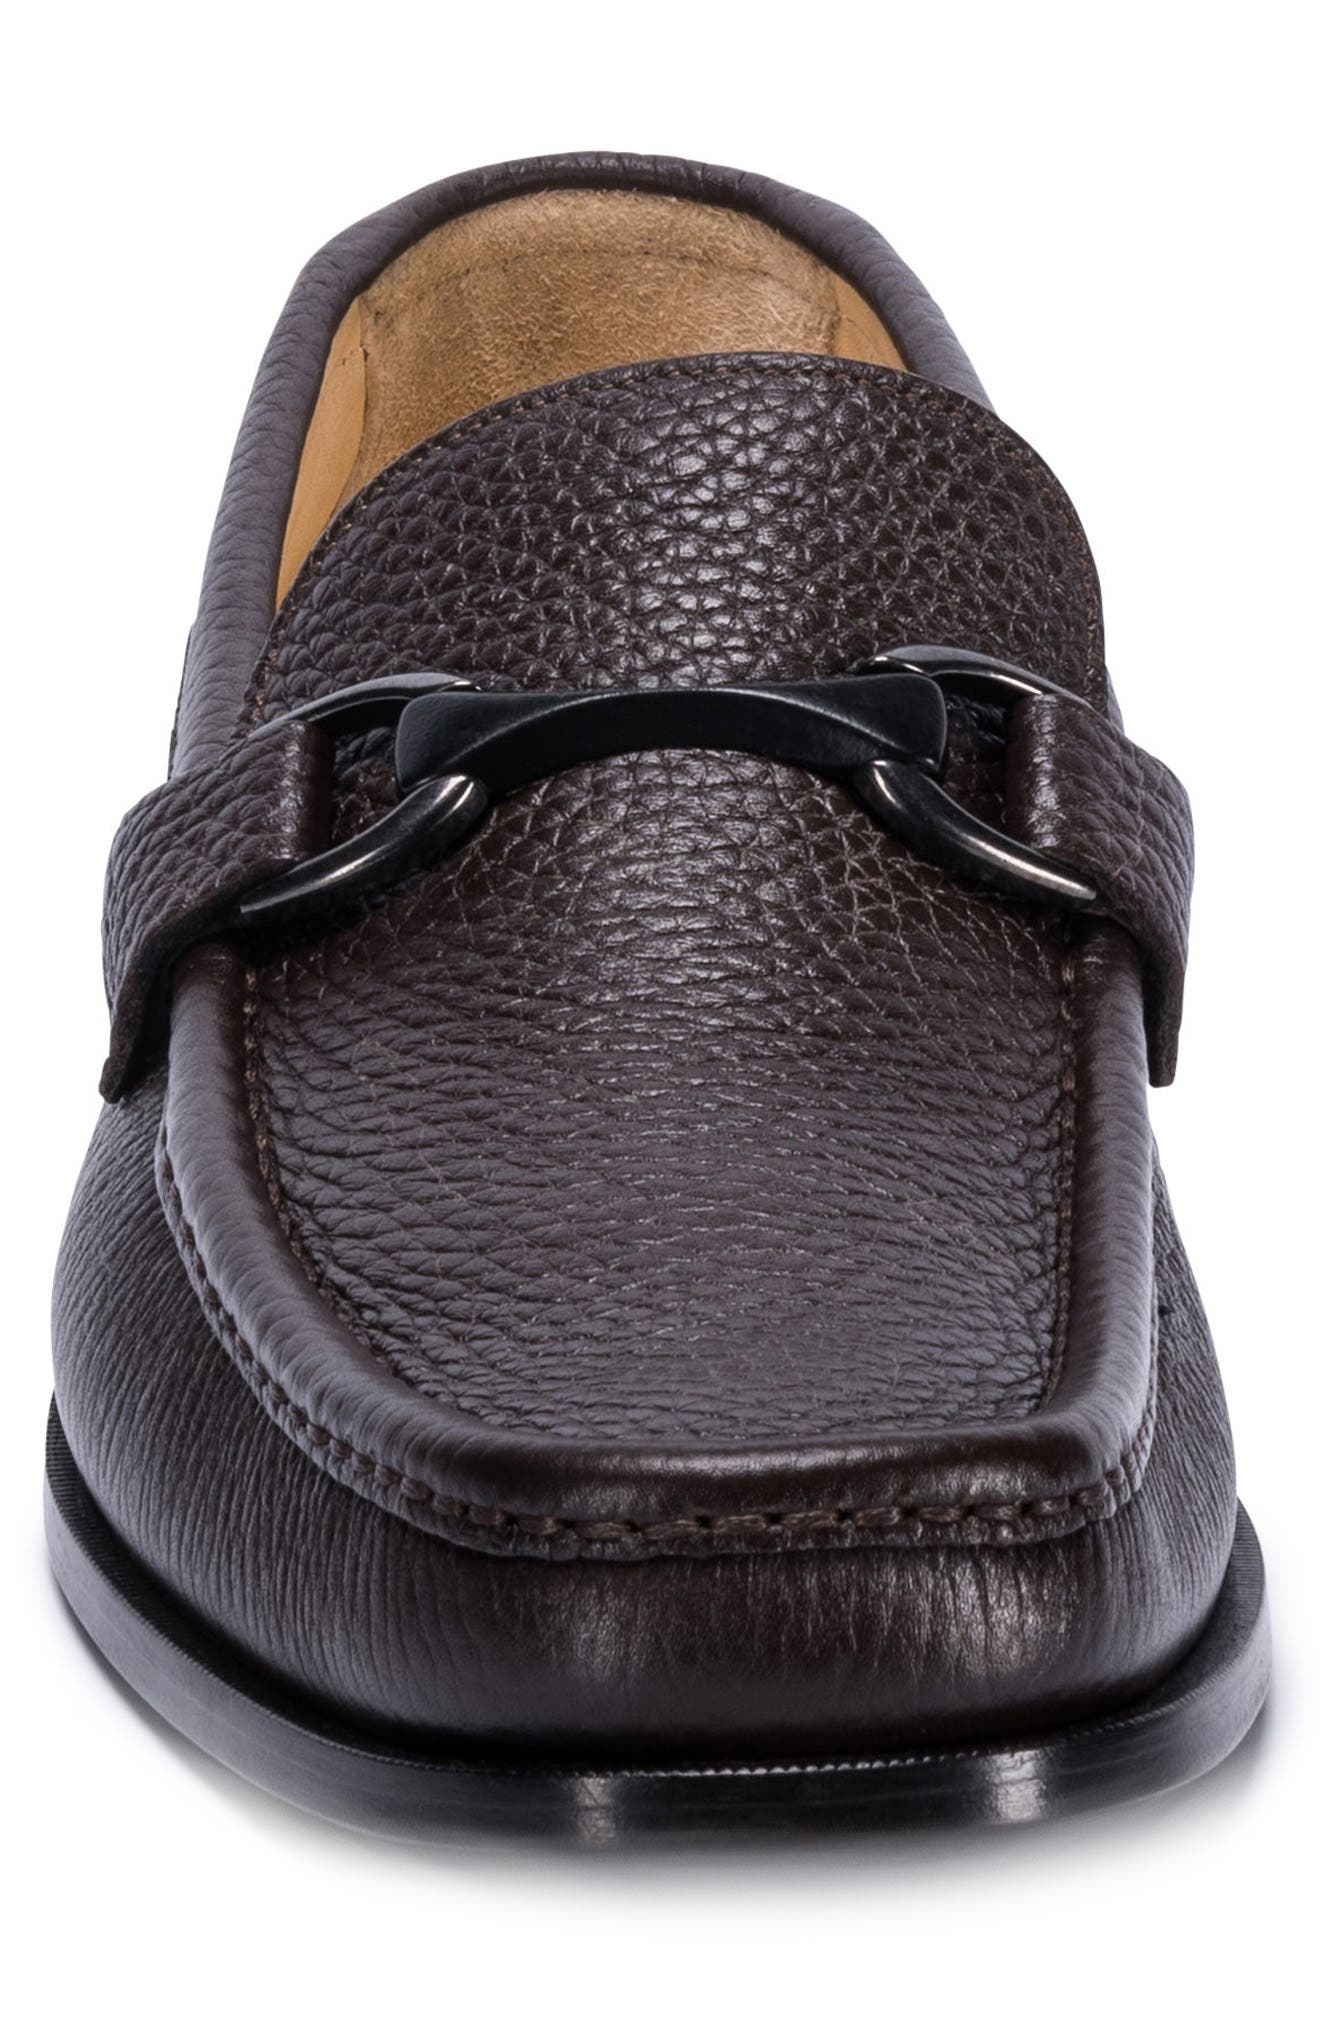 Padua Bit Loafer,                             Alternate thumbnail 4, color,                             Brown Leather